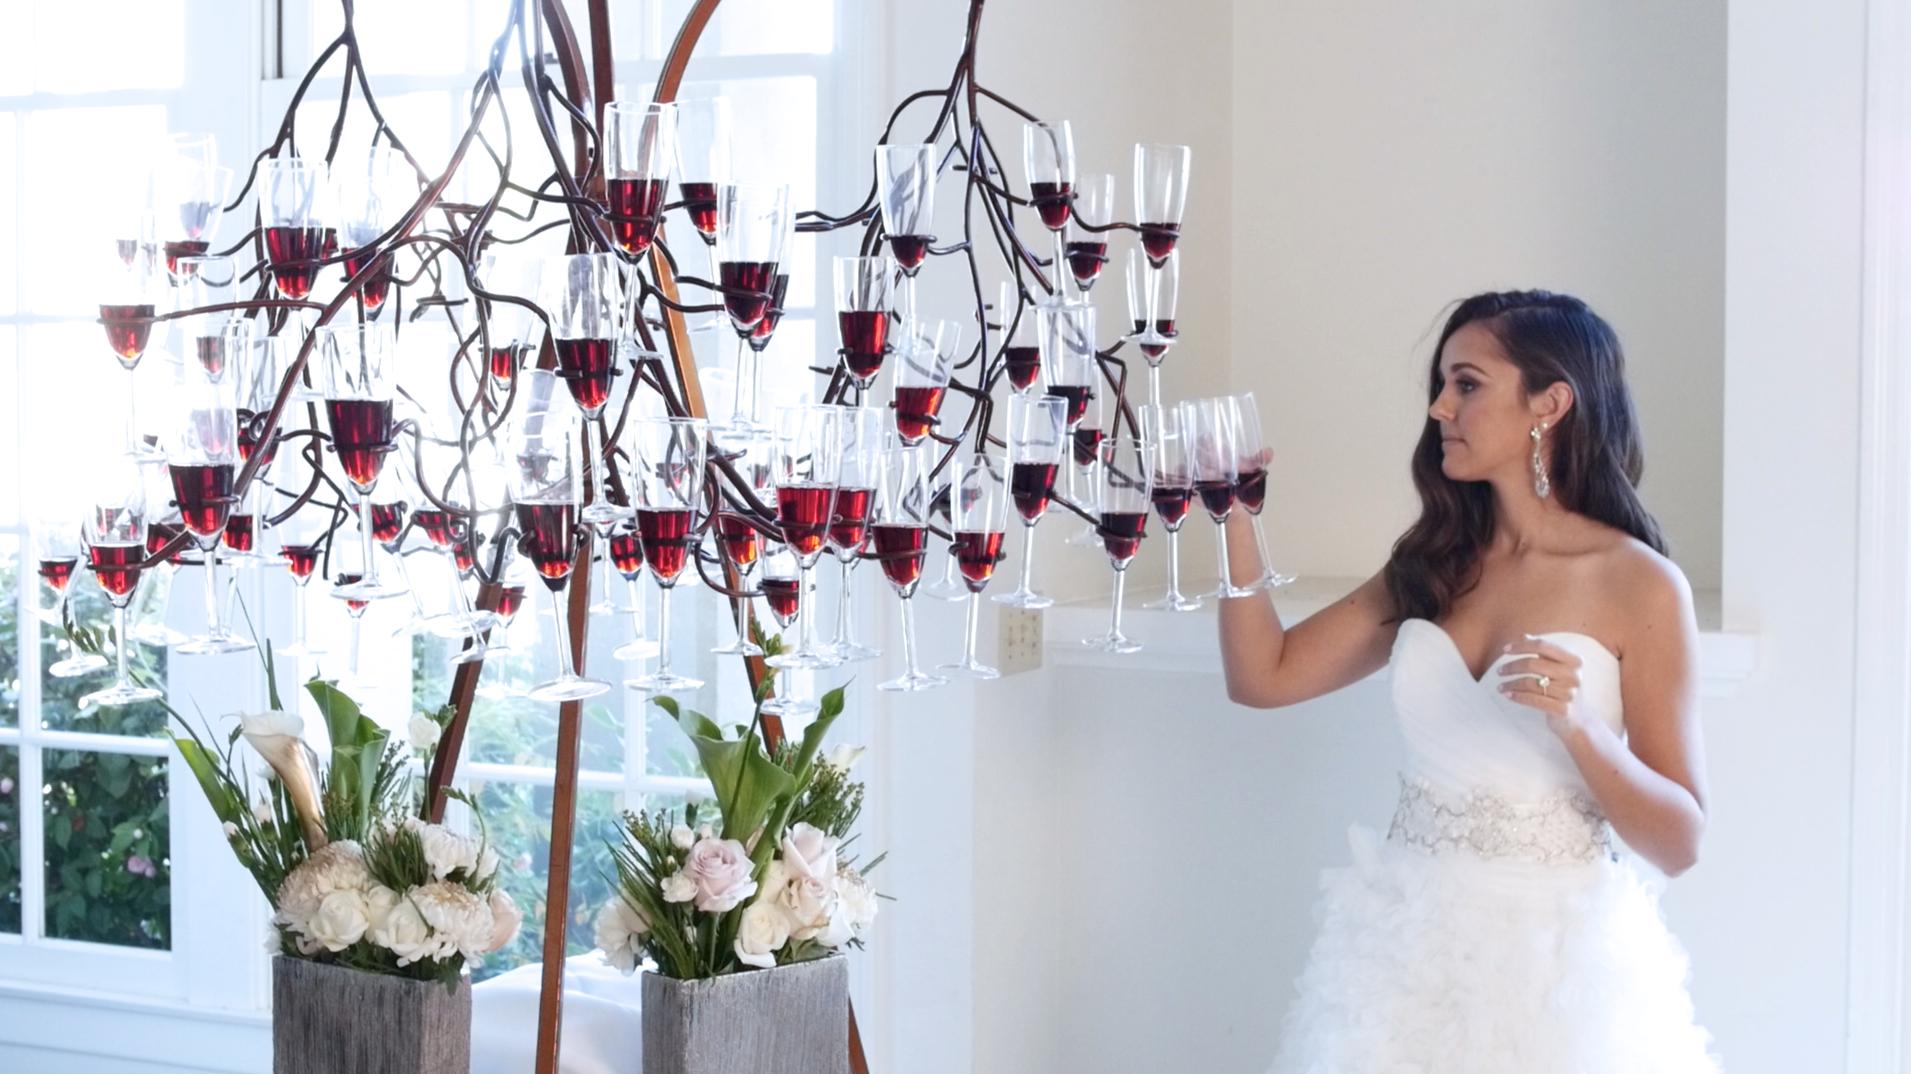 Have a wine tree at your wedding! #audreyalbafilms http://www.audreyalbafilms.com